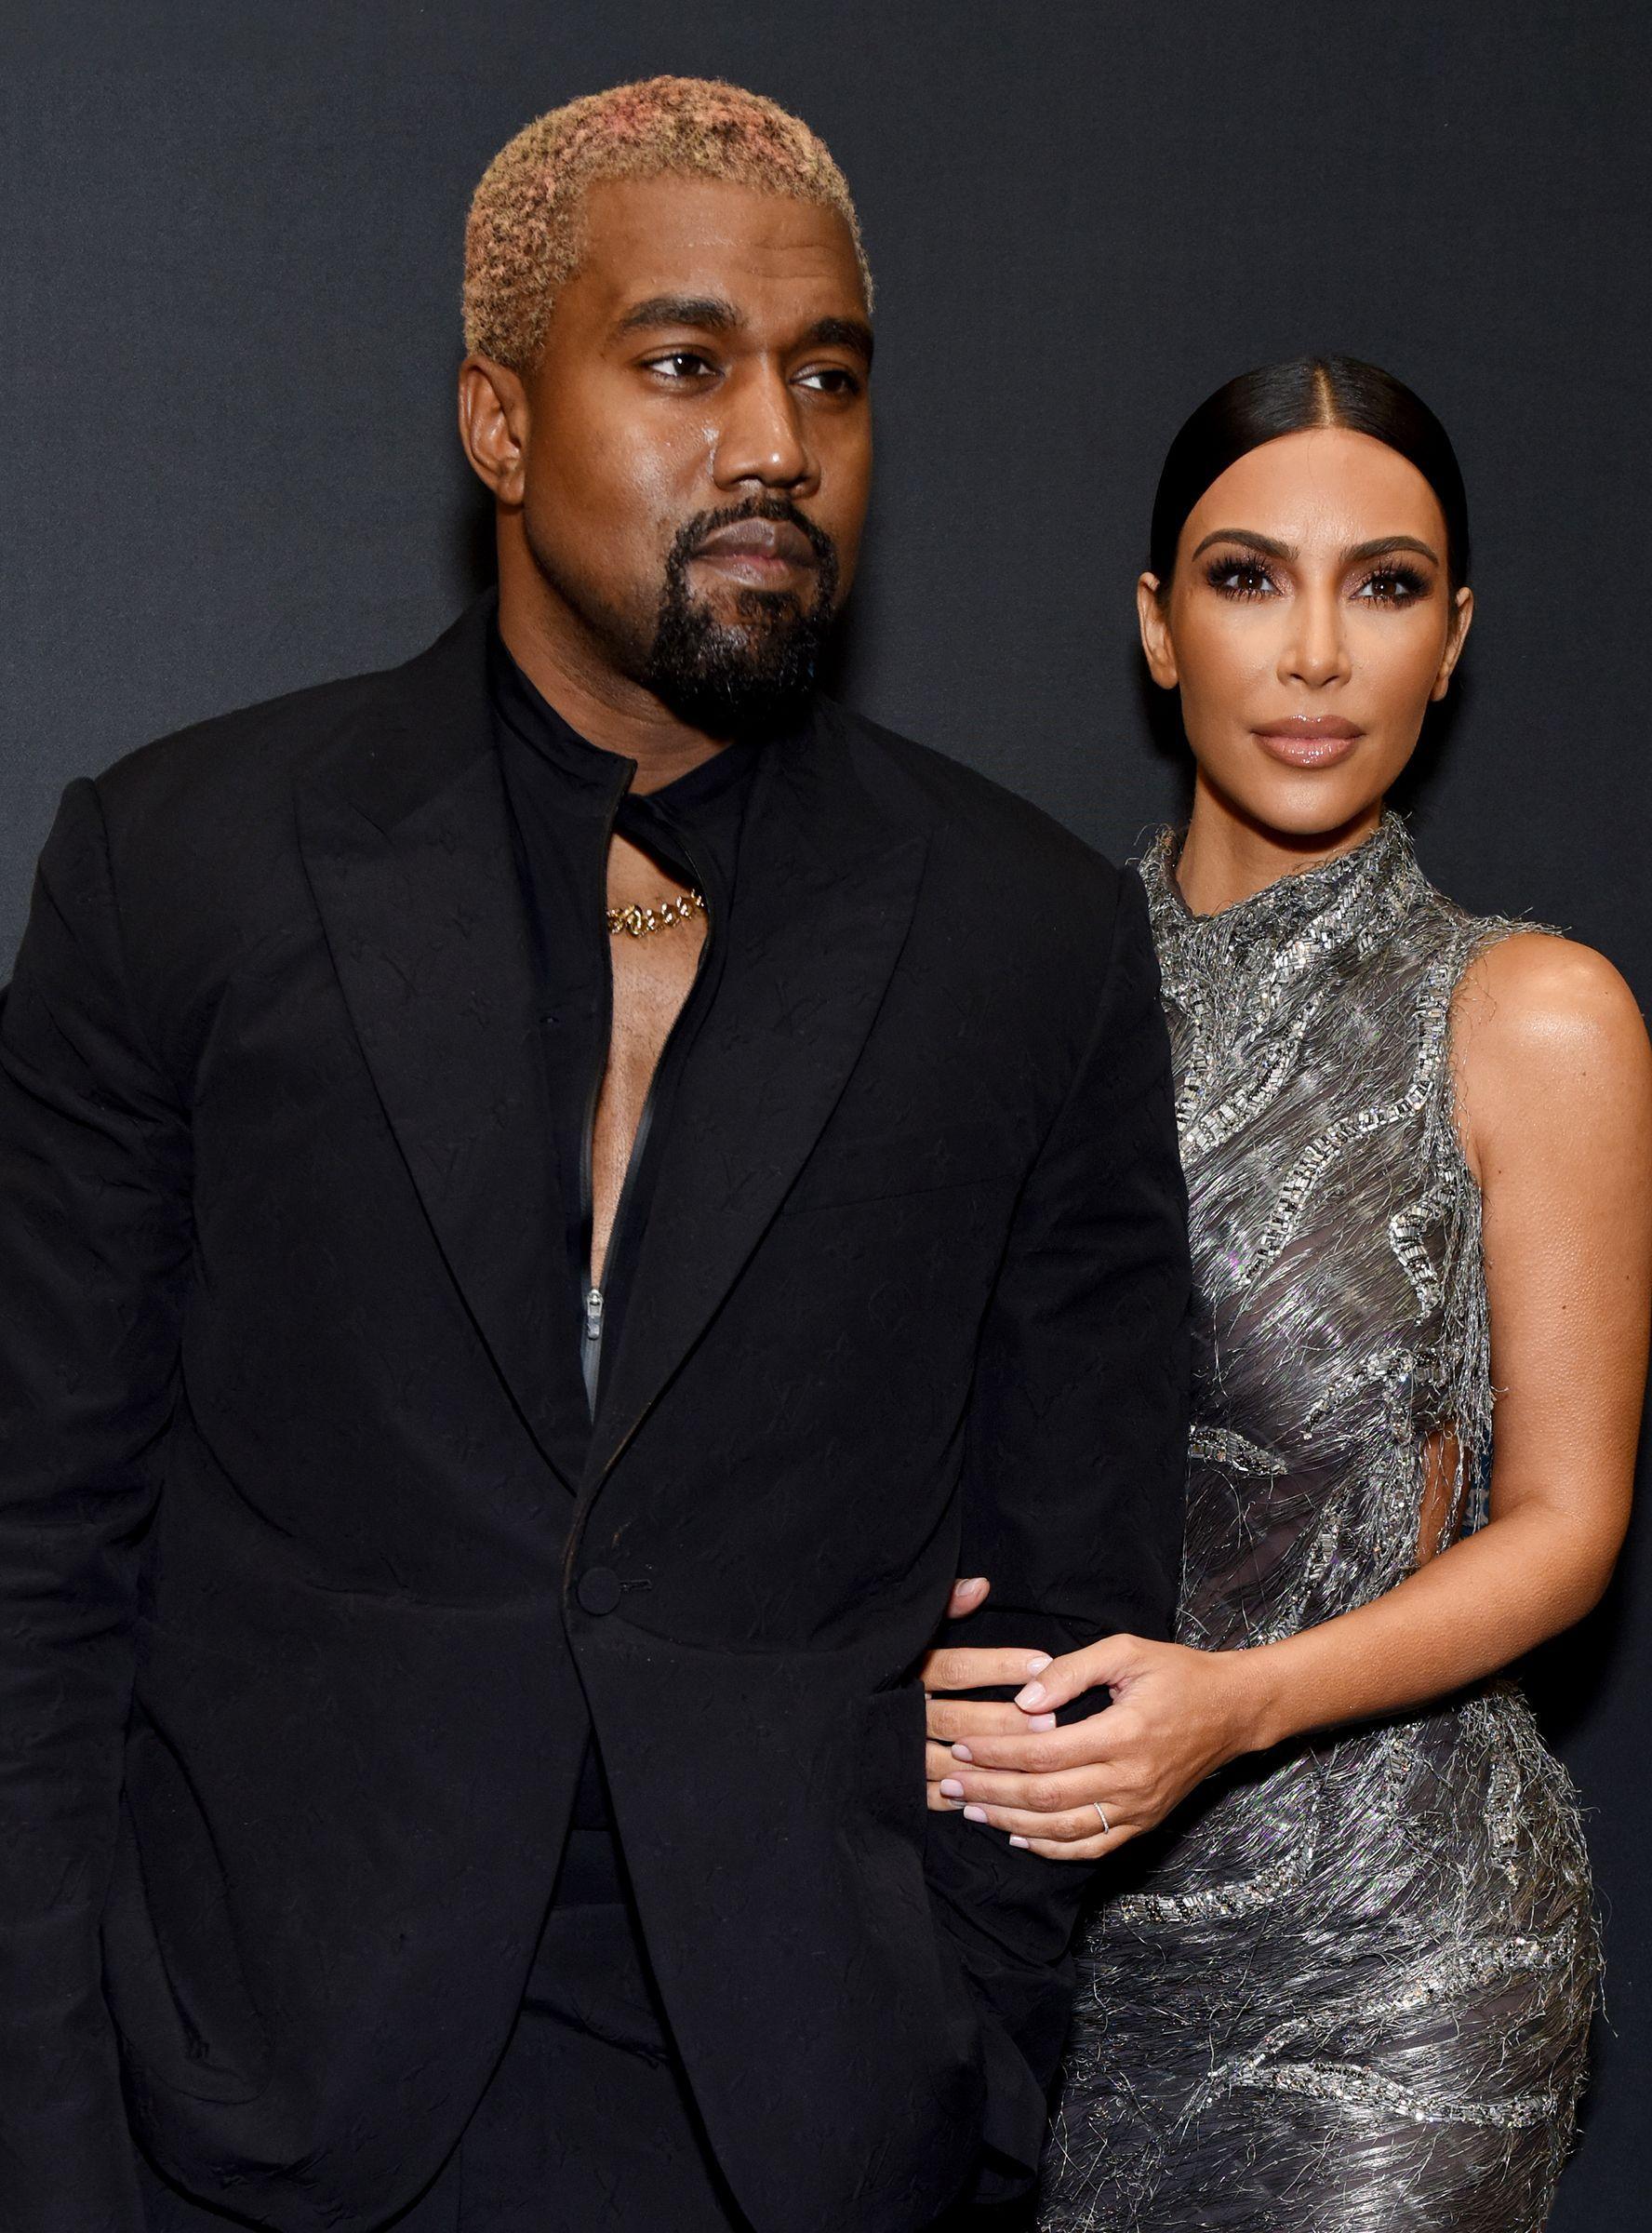 4c7b3db76c1 Everything We Know About Kanye West & Kim Kardashian's Sunday Services  https://